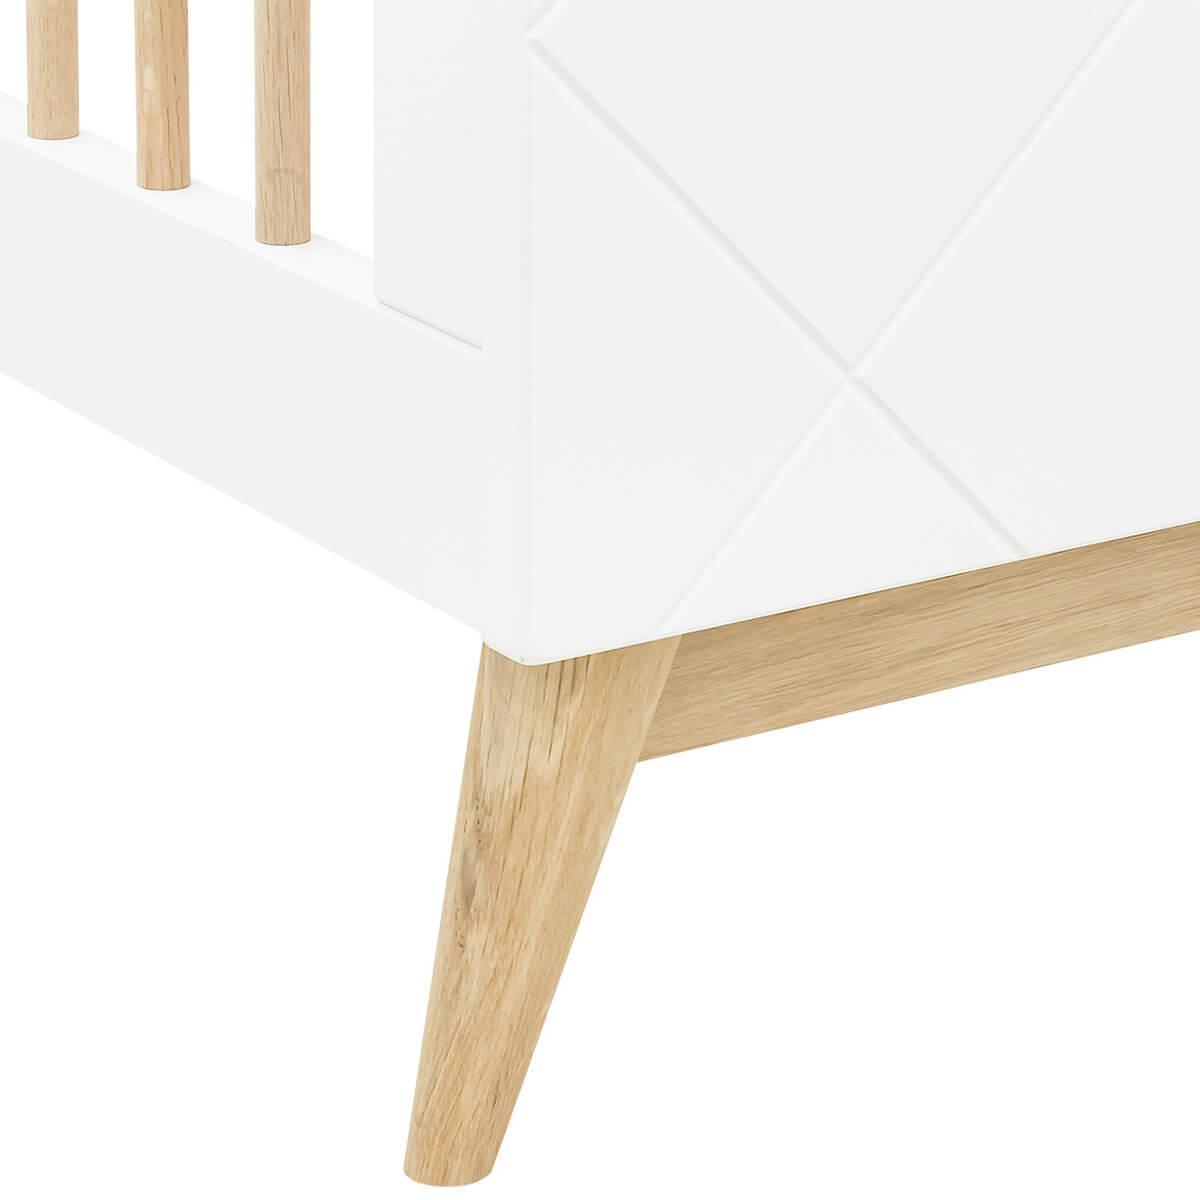 Cuna 60x120cm PARIS Bopita blanco-roble